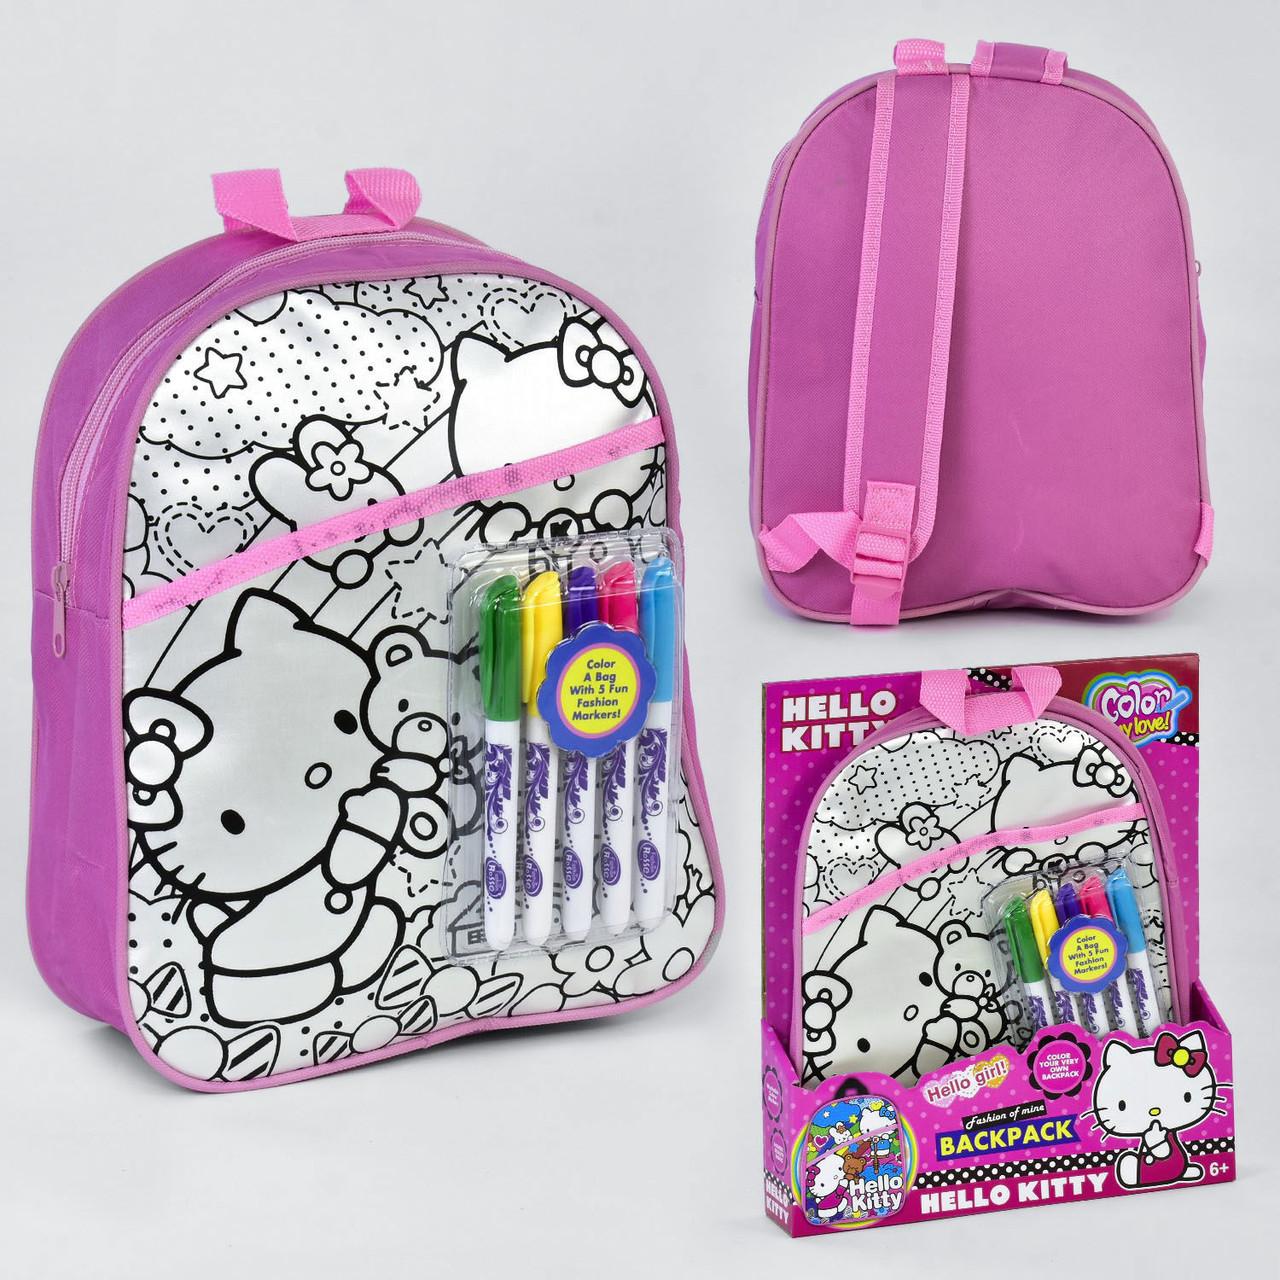 набор для творчества рюкзак раскраска Hello Kitty арт 20187